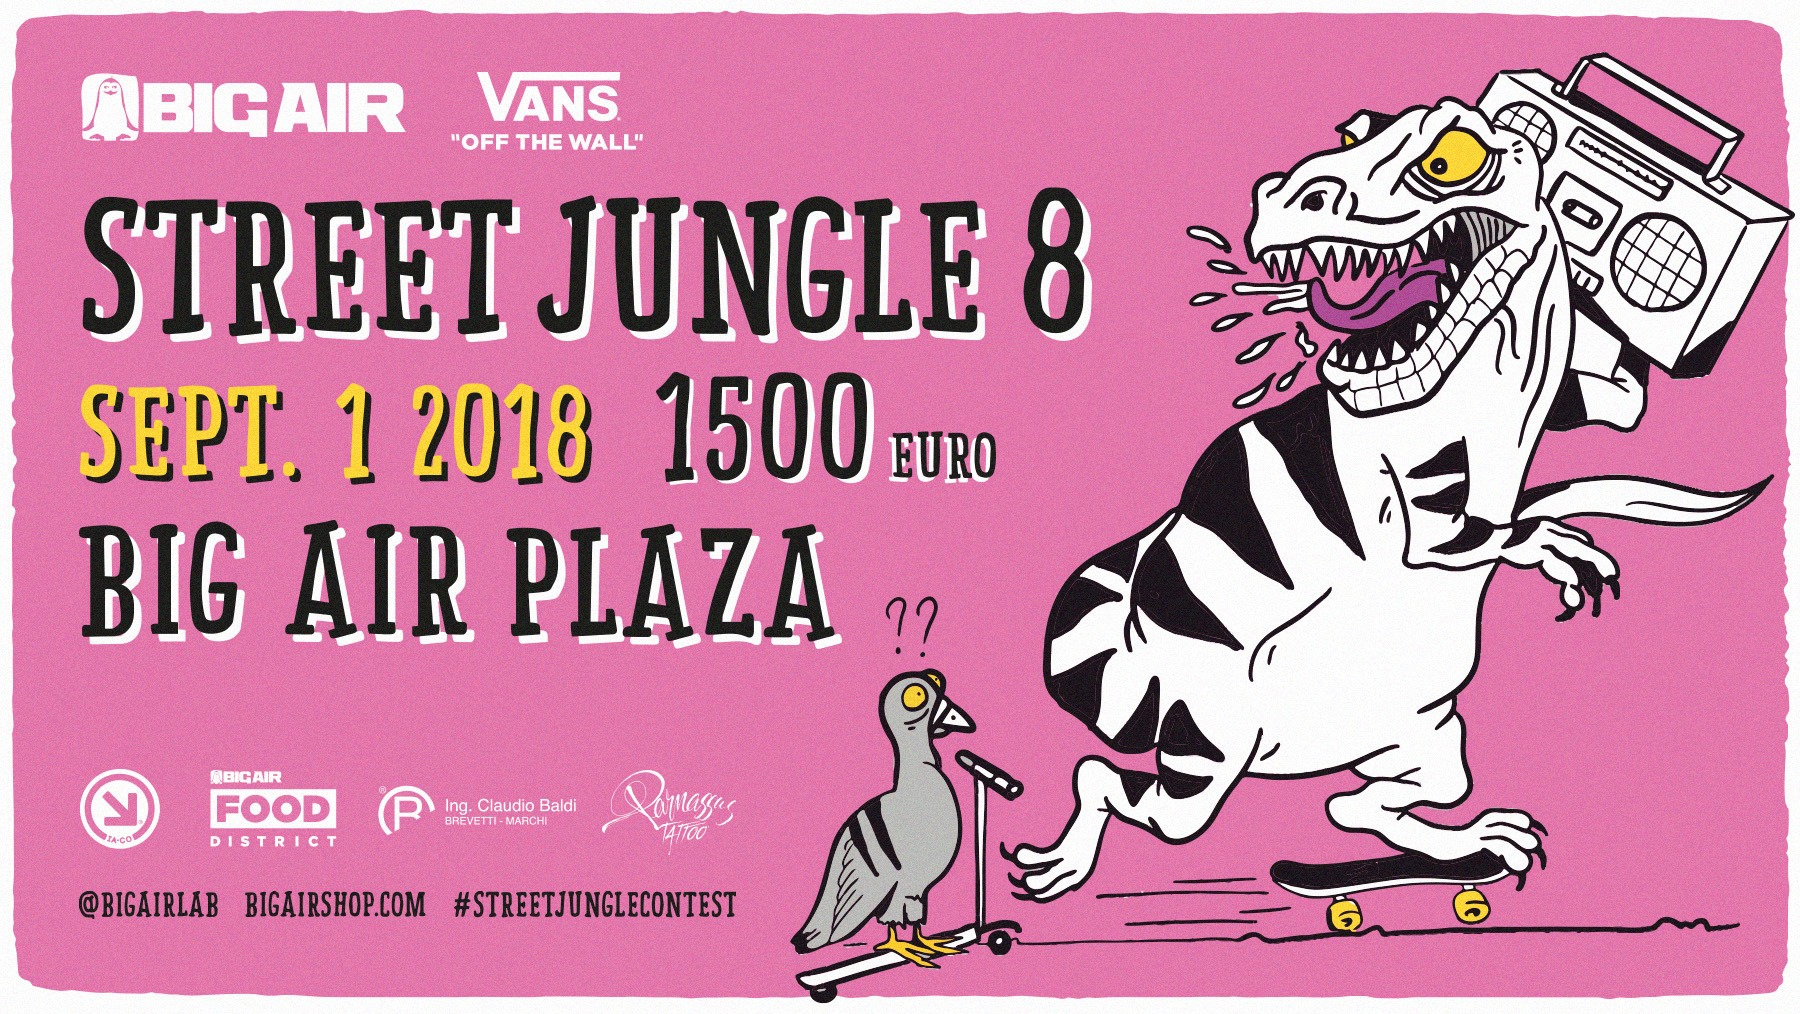 Street jungle 8